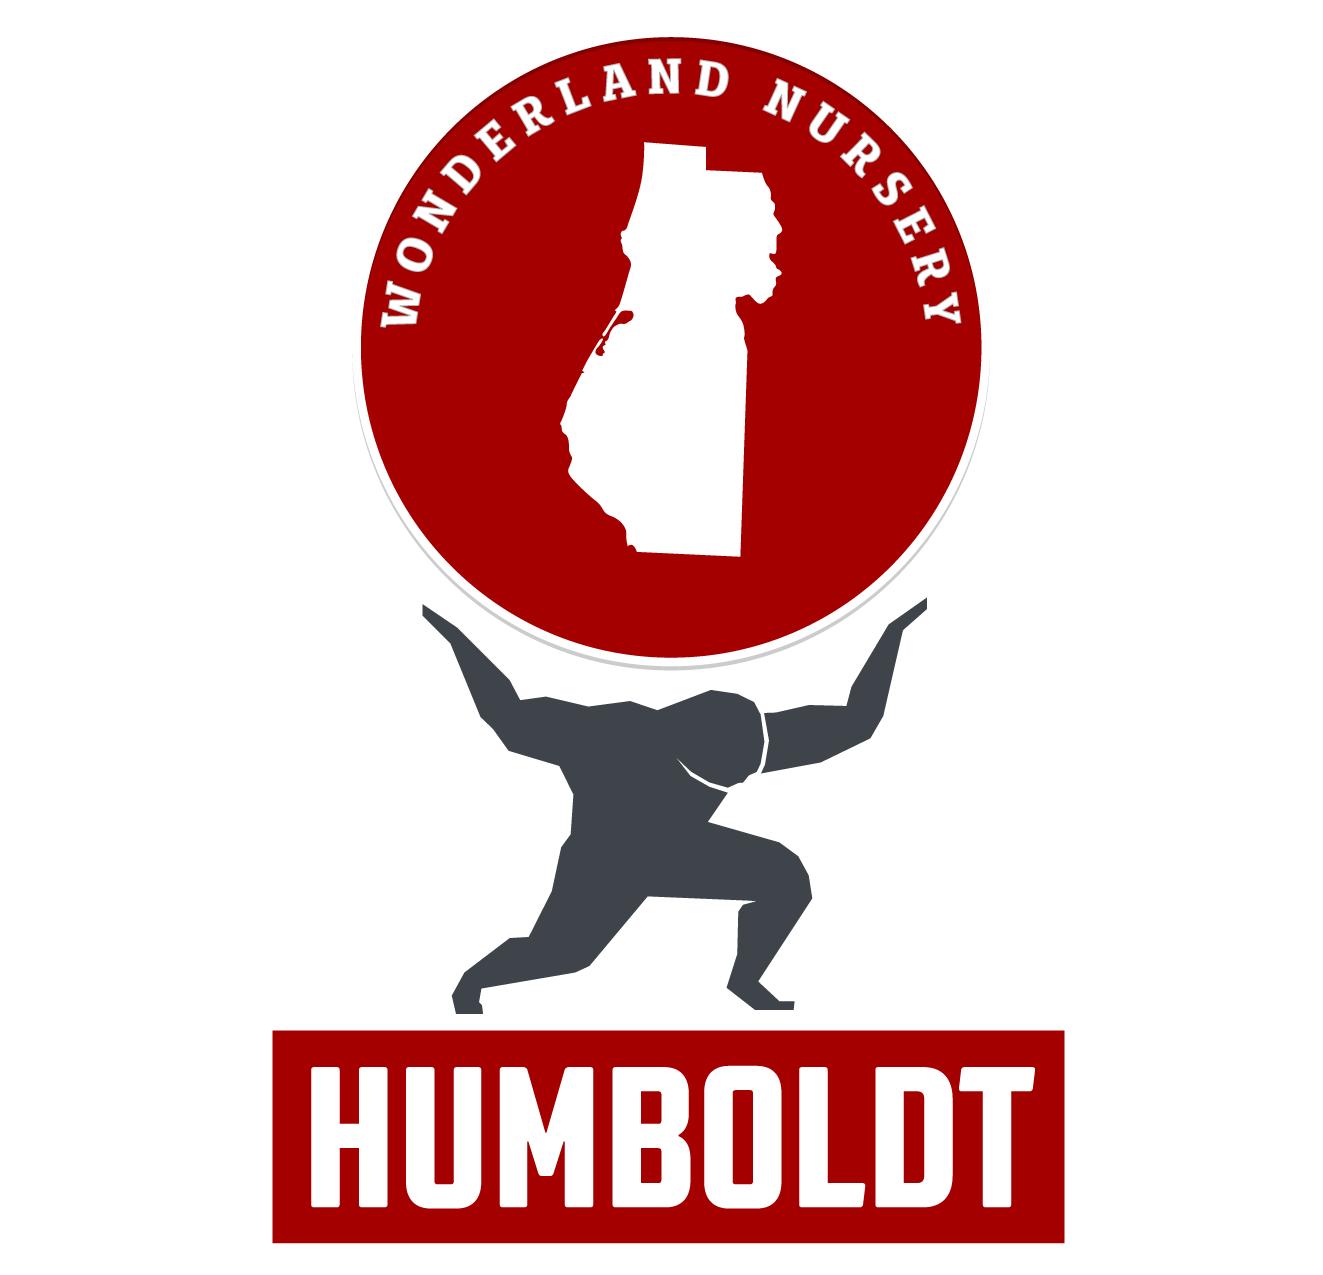 wonderland_nursery_logo.png